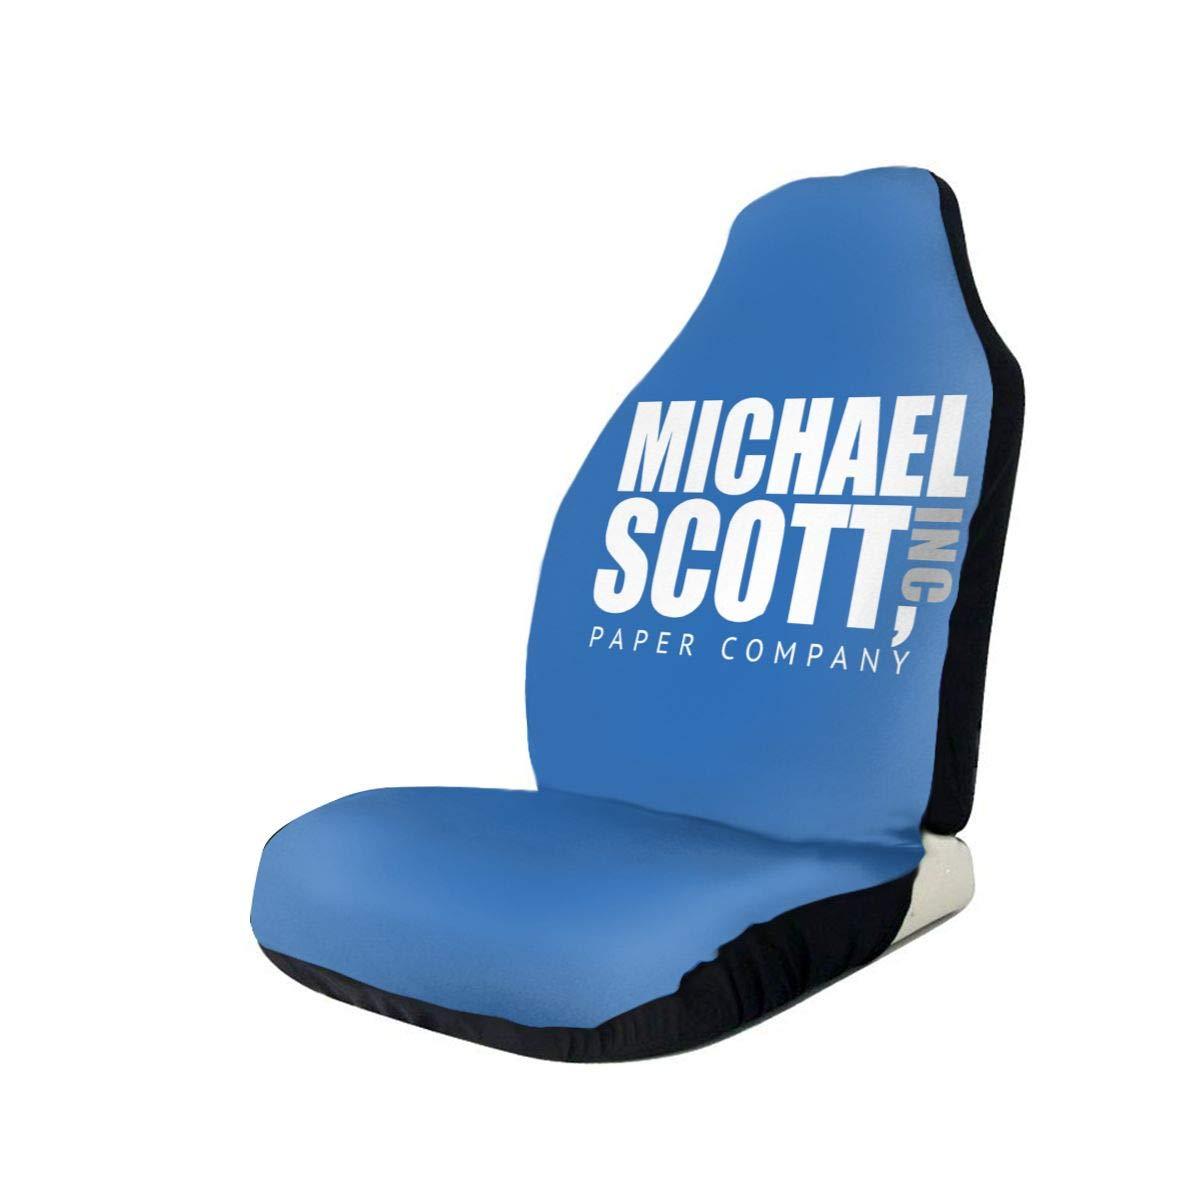 Michael Scott Paper Company Car Seat Covers Car Seat Protector Covers ,Fit Most Cars, Sedan, SUV,Van